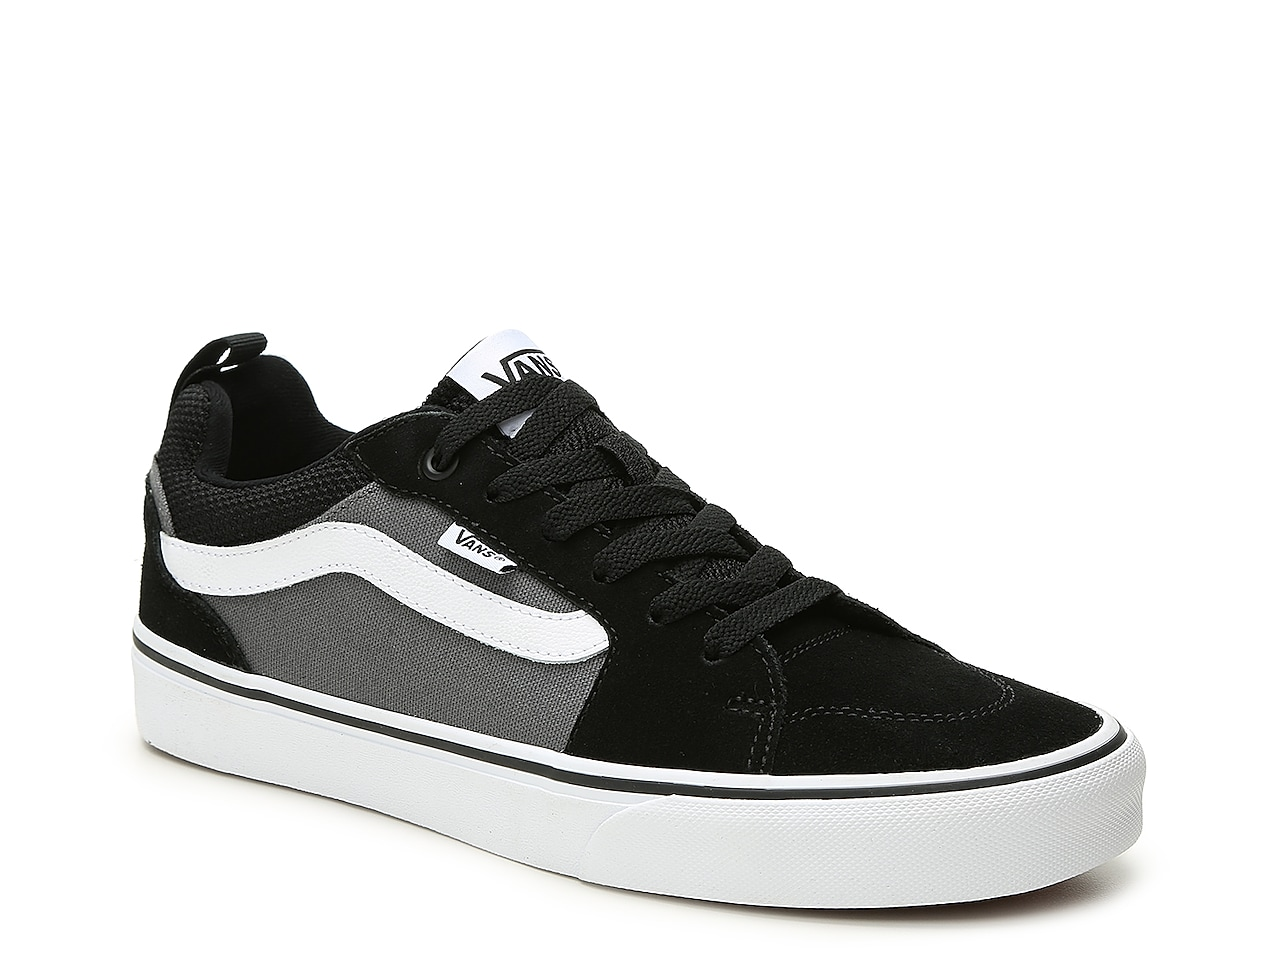 Filmore Sneaker - Men's